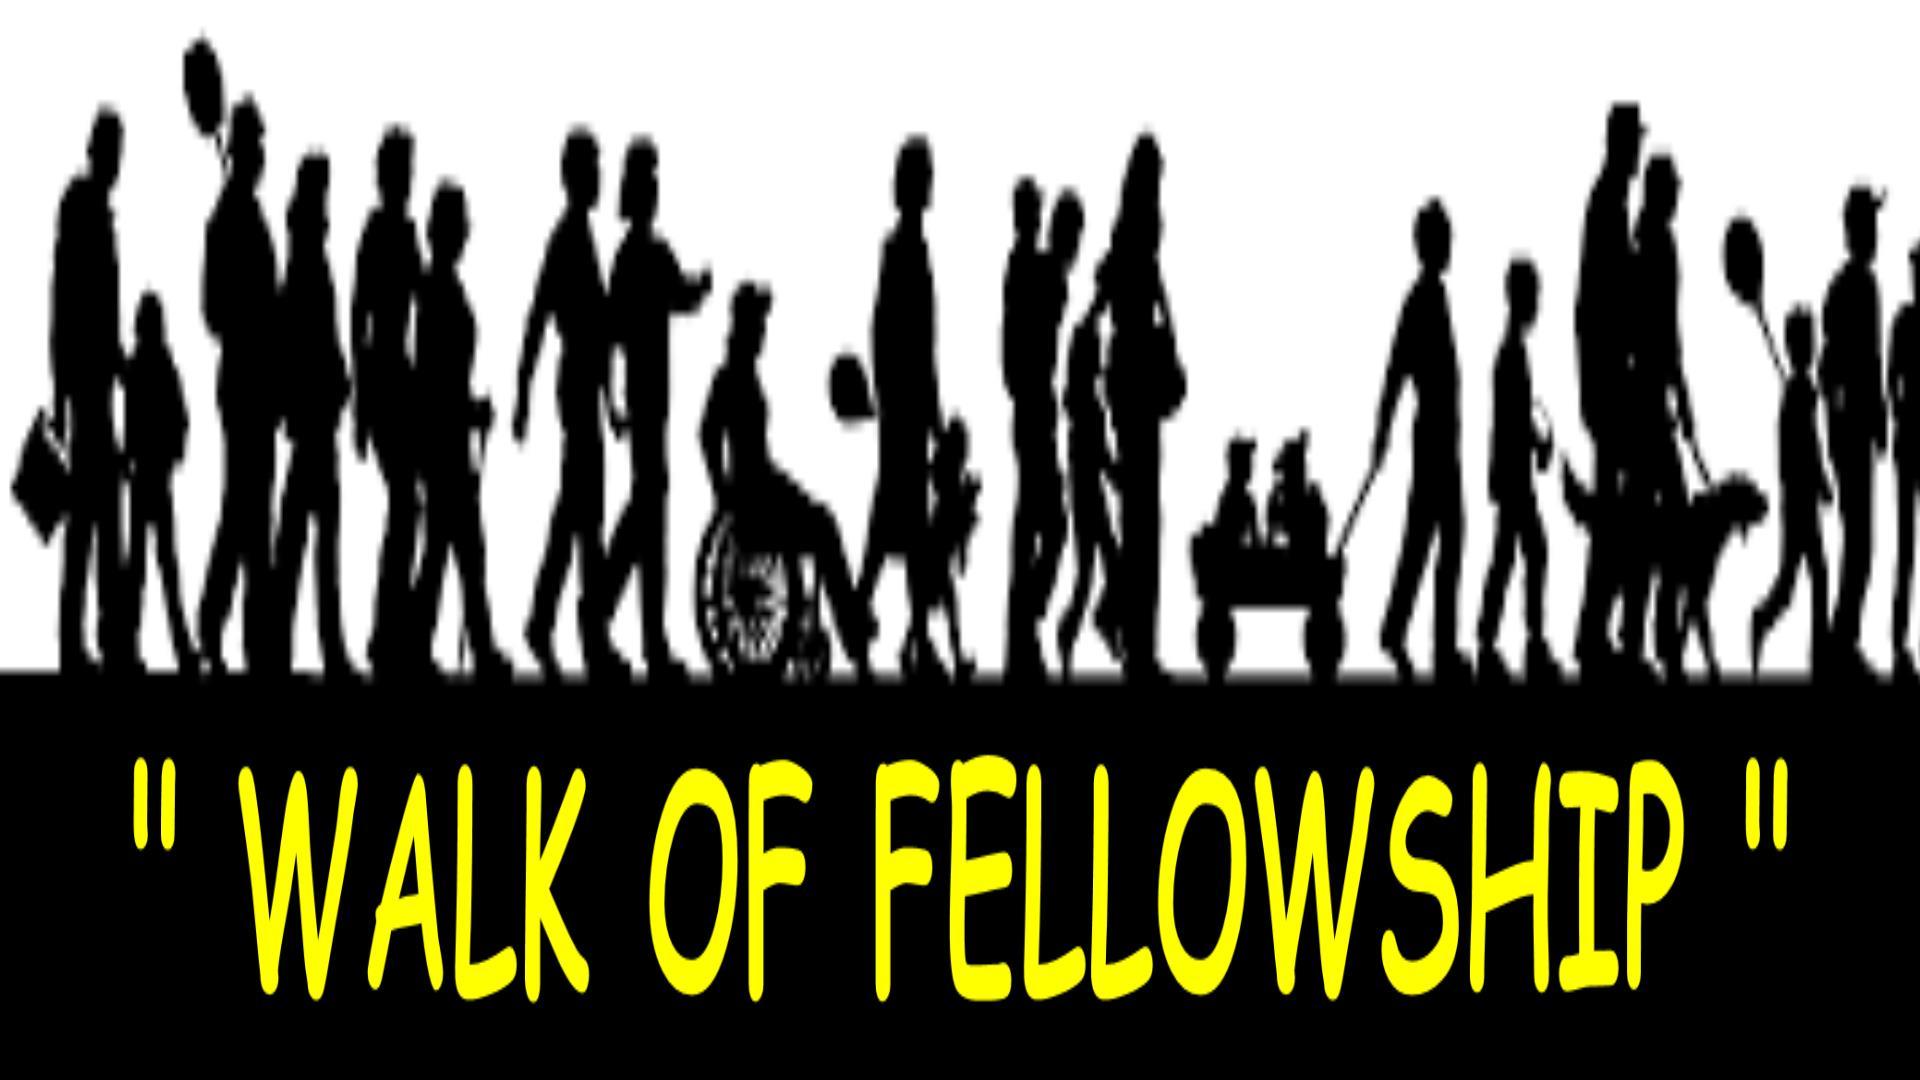 WALK  of  FELLOWSHIP